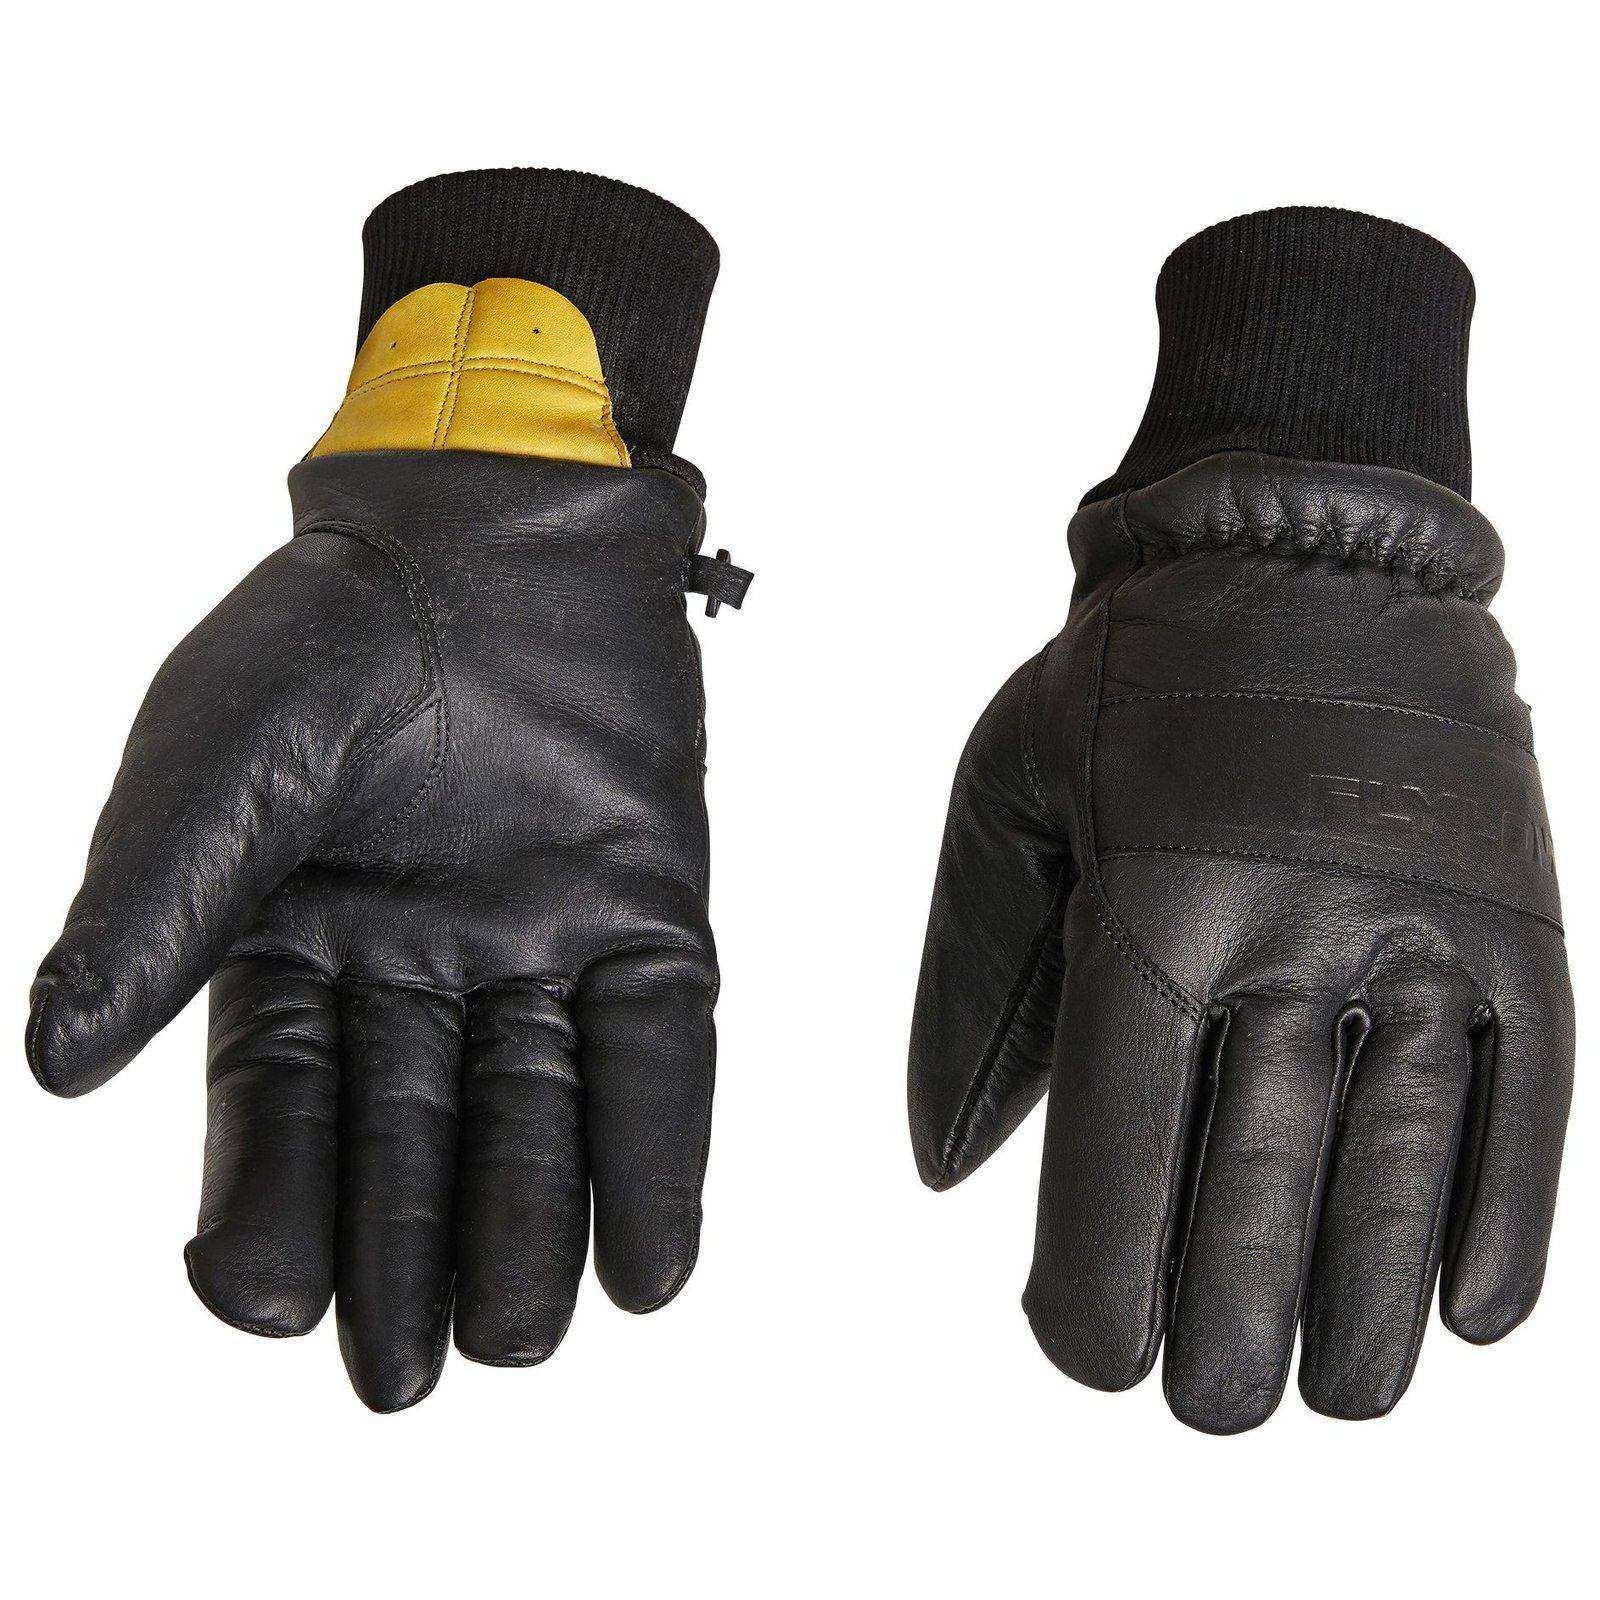 483d28cd6 Flylow Ridge Glove on Sale   Powder7.com